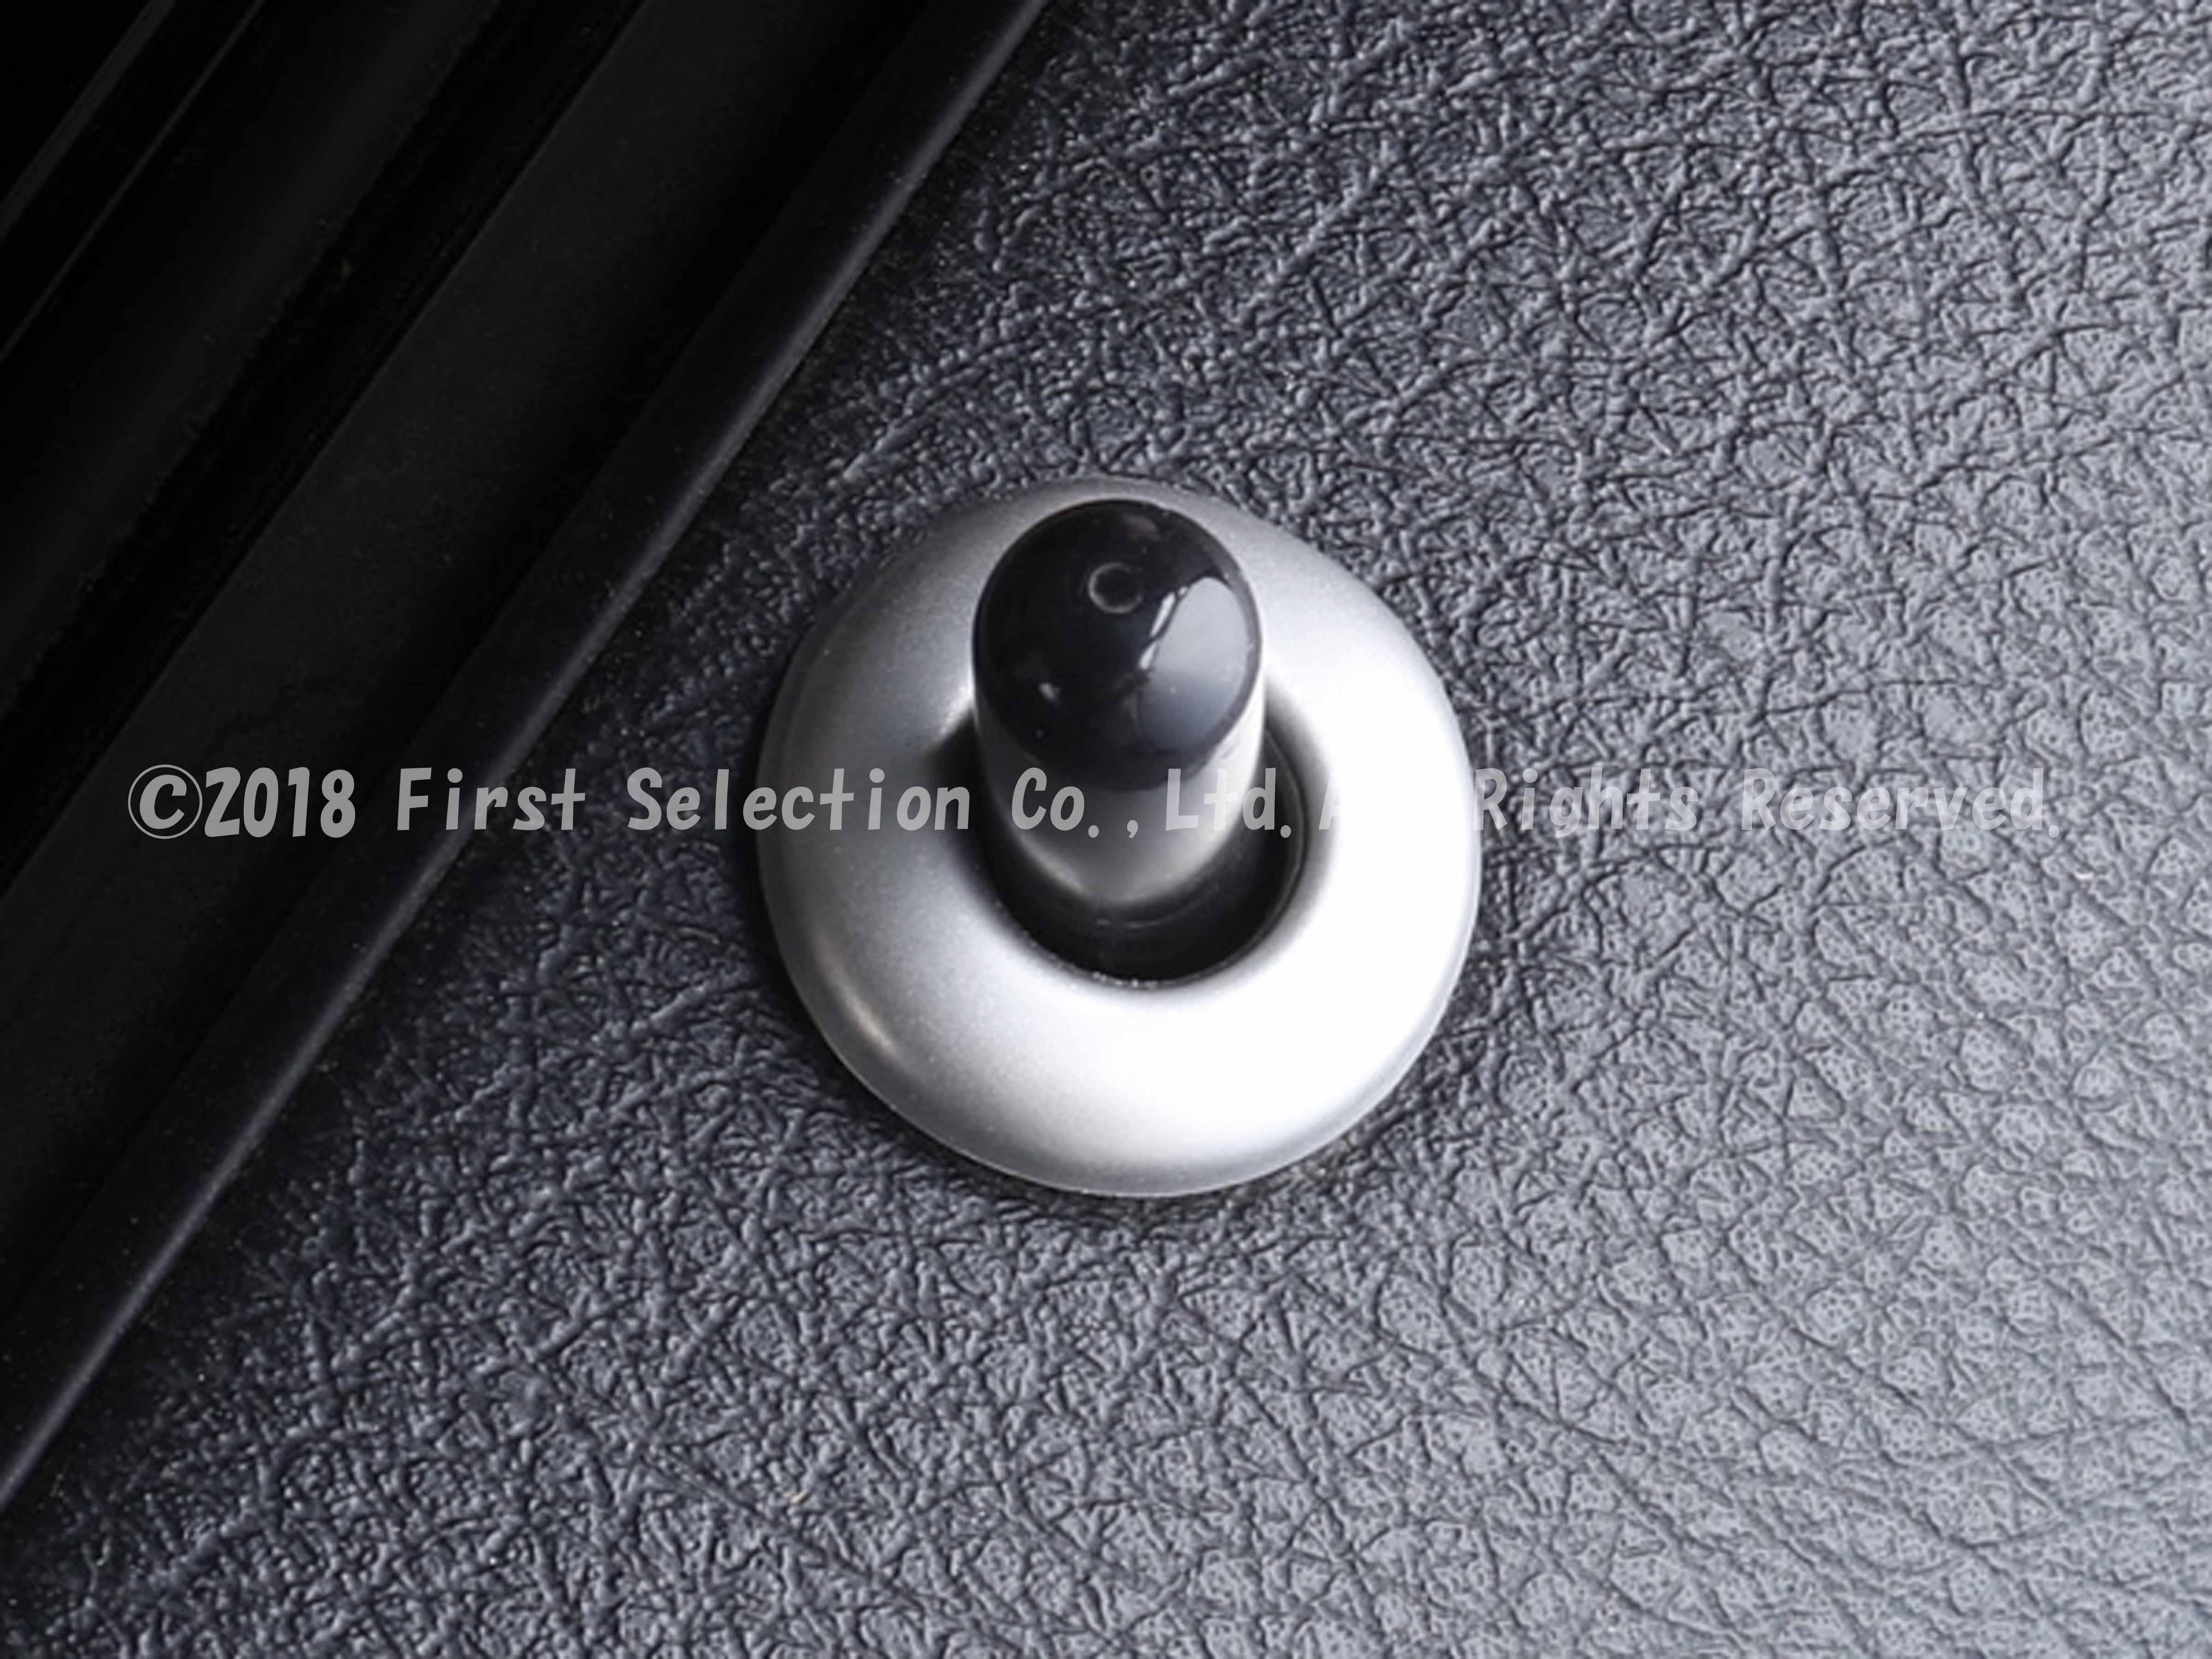 BMW車 F系3シリーズ用 ドアロックデコレーションリング4ピース